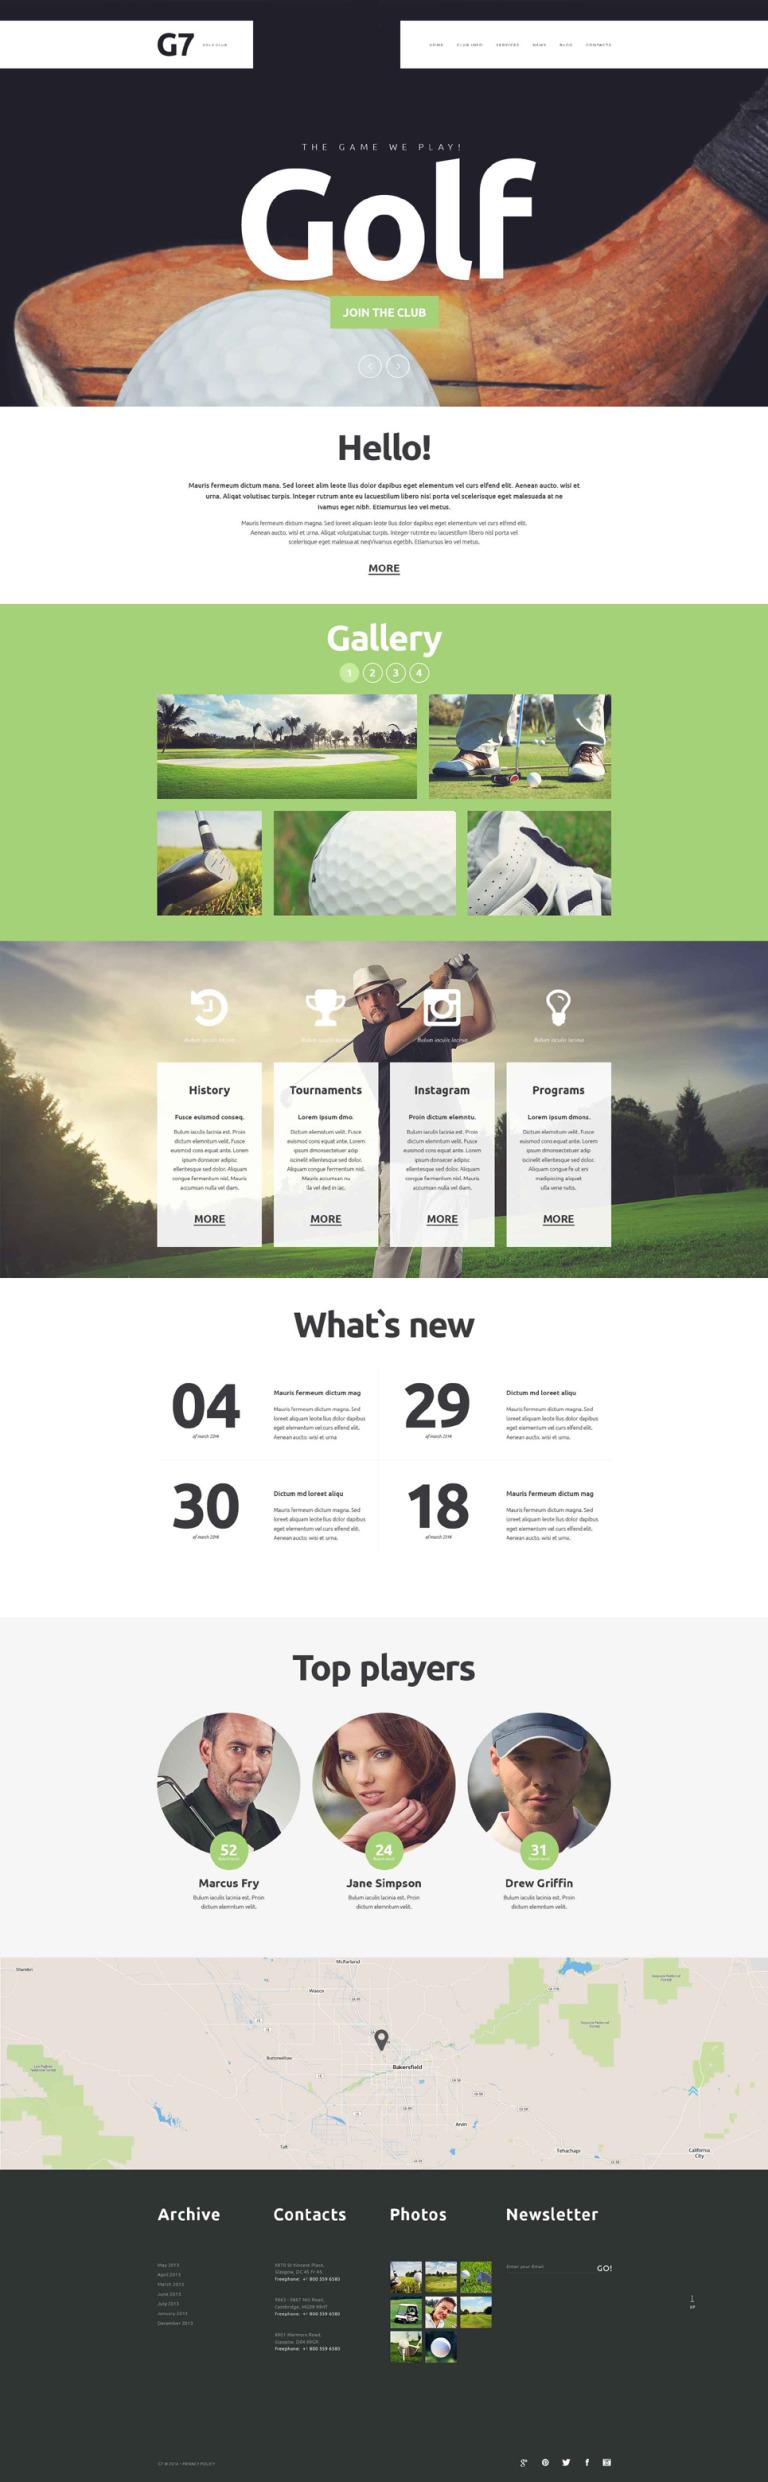 Golf Club Website Template New Screenshots BIG